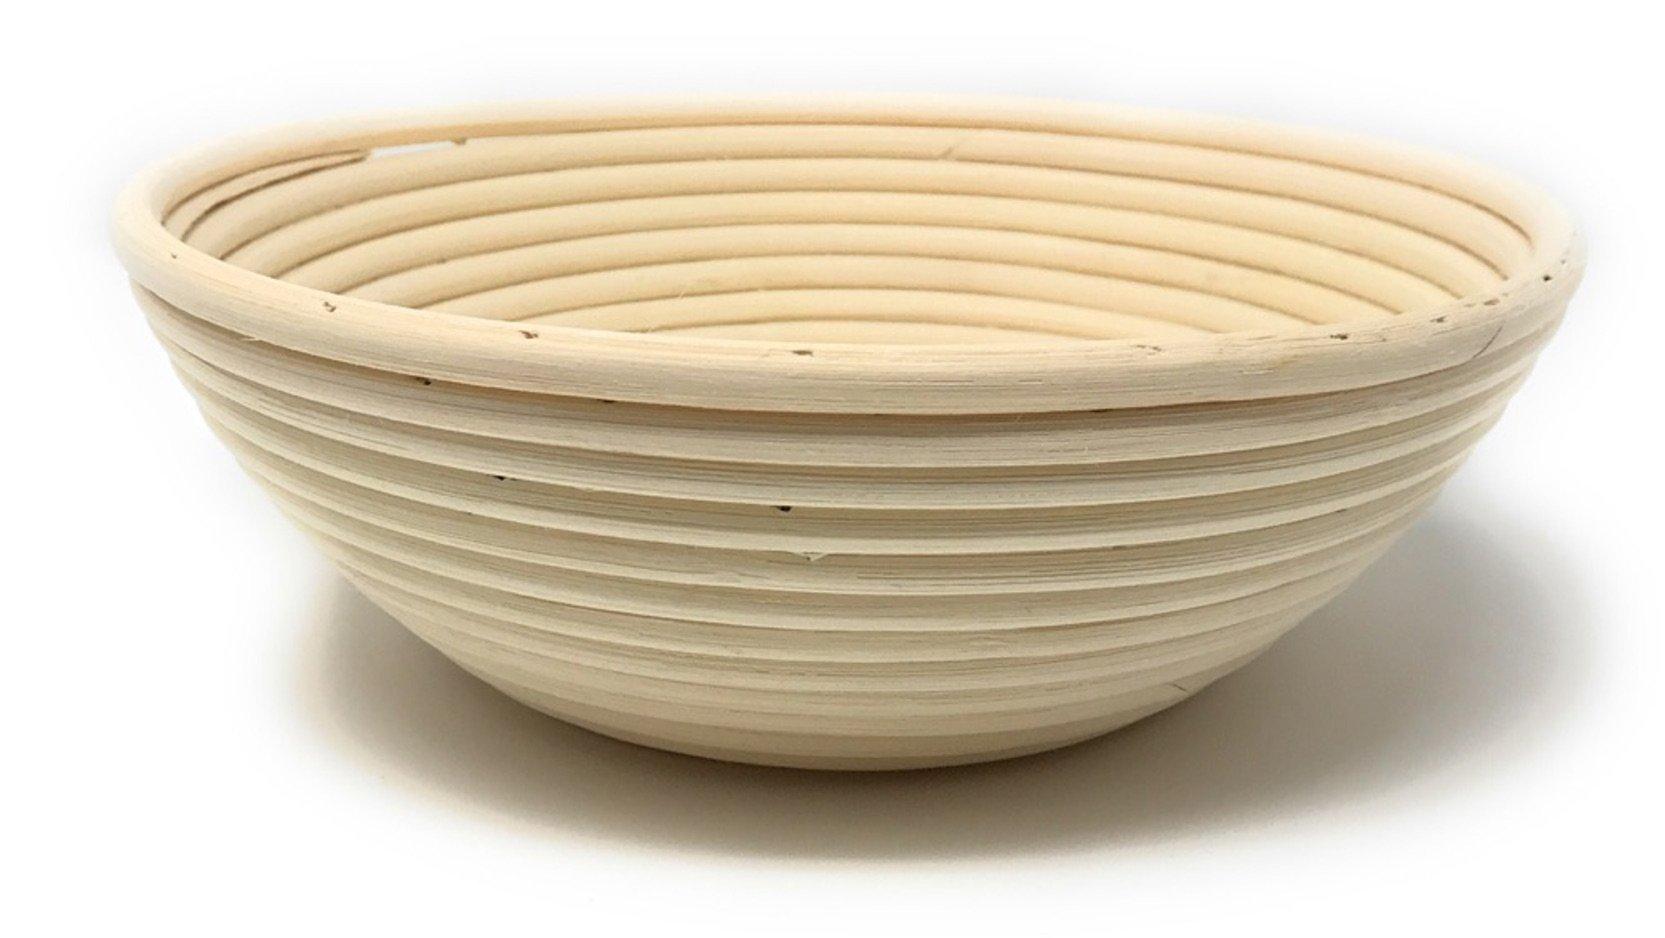 3-Piece Set: Emile Henry Ceramic Round Stewpot Dutch Oven Bread Pot, Burgundy, 8 inch Round Banneton Bread Rising Basket, Fitted Cotton Liner - Bundle by Bundle (Image #4)